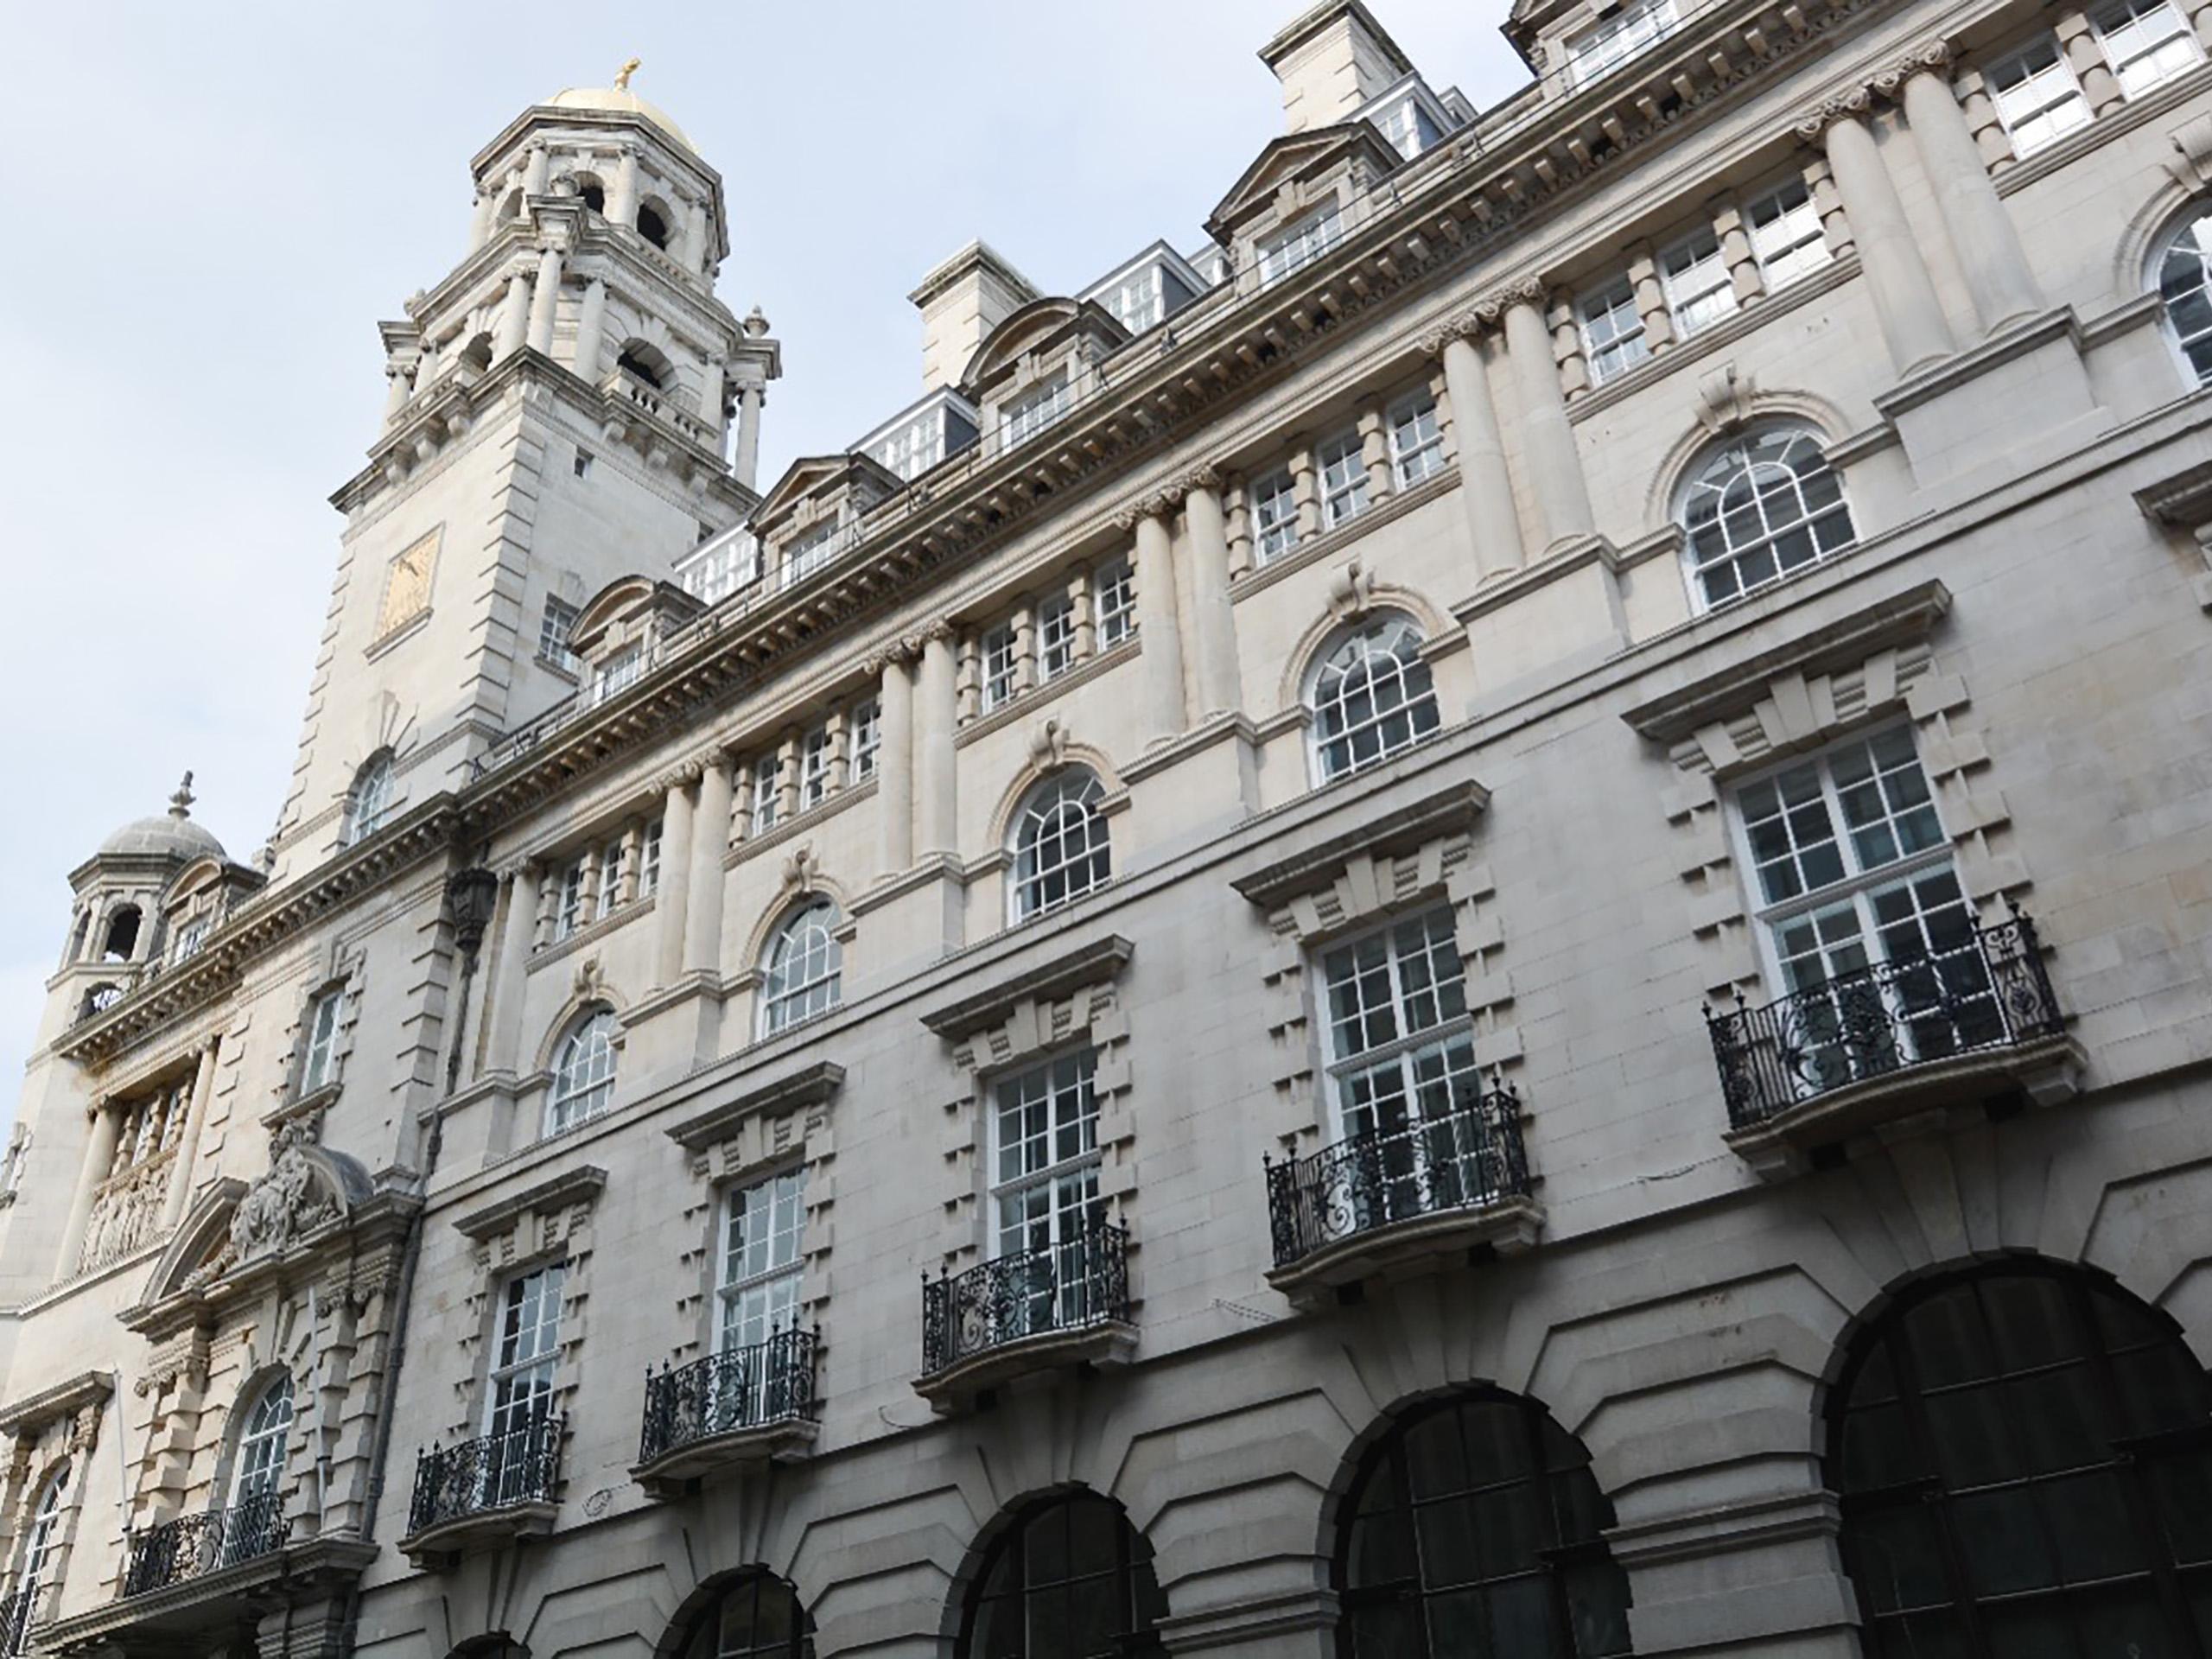 Royal Insurance Building Liverpool 1